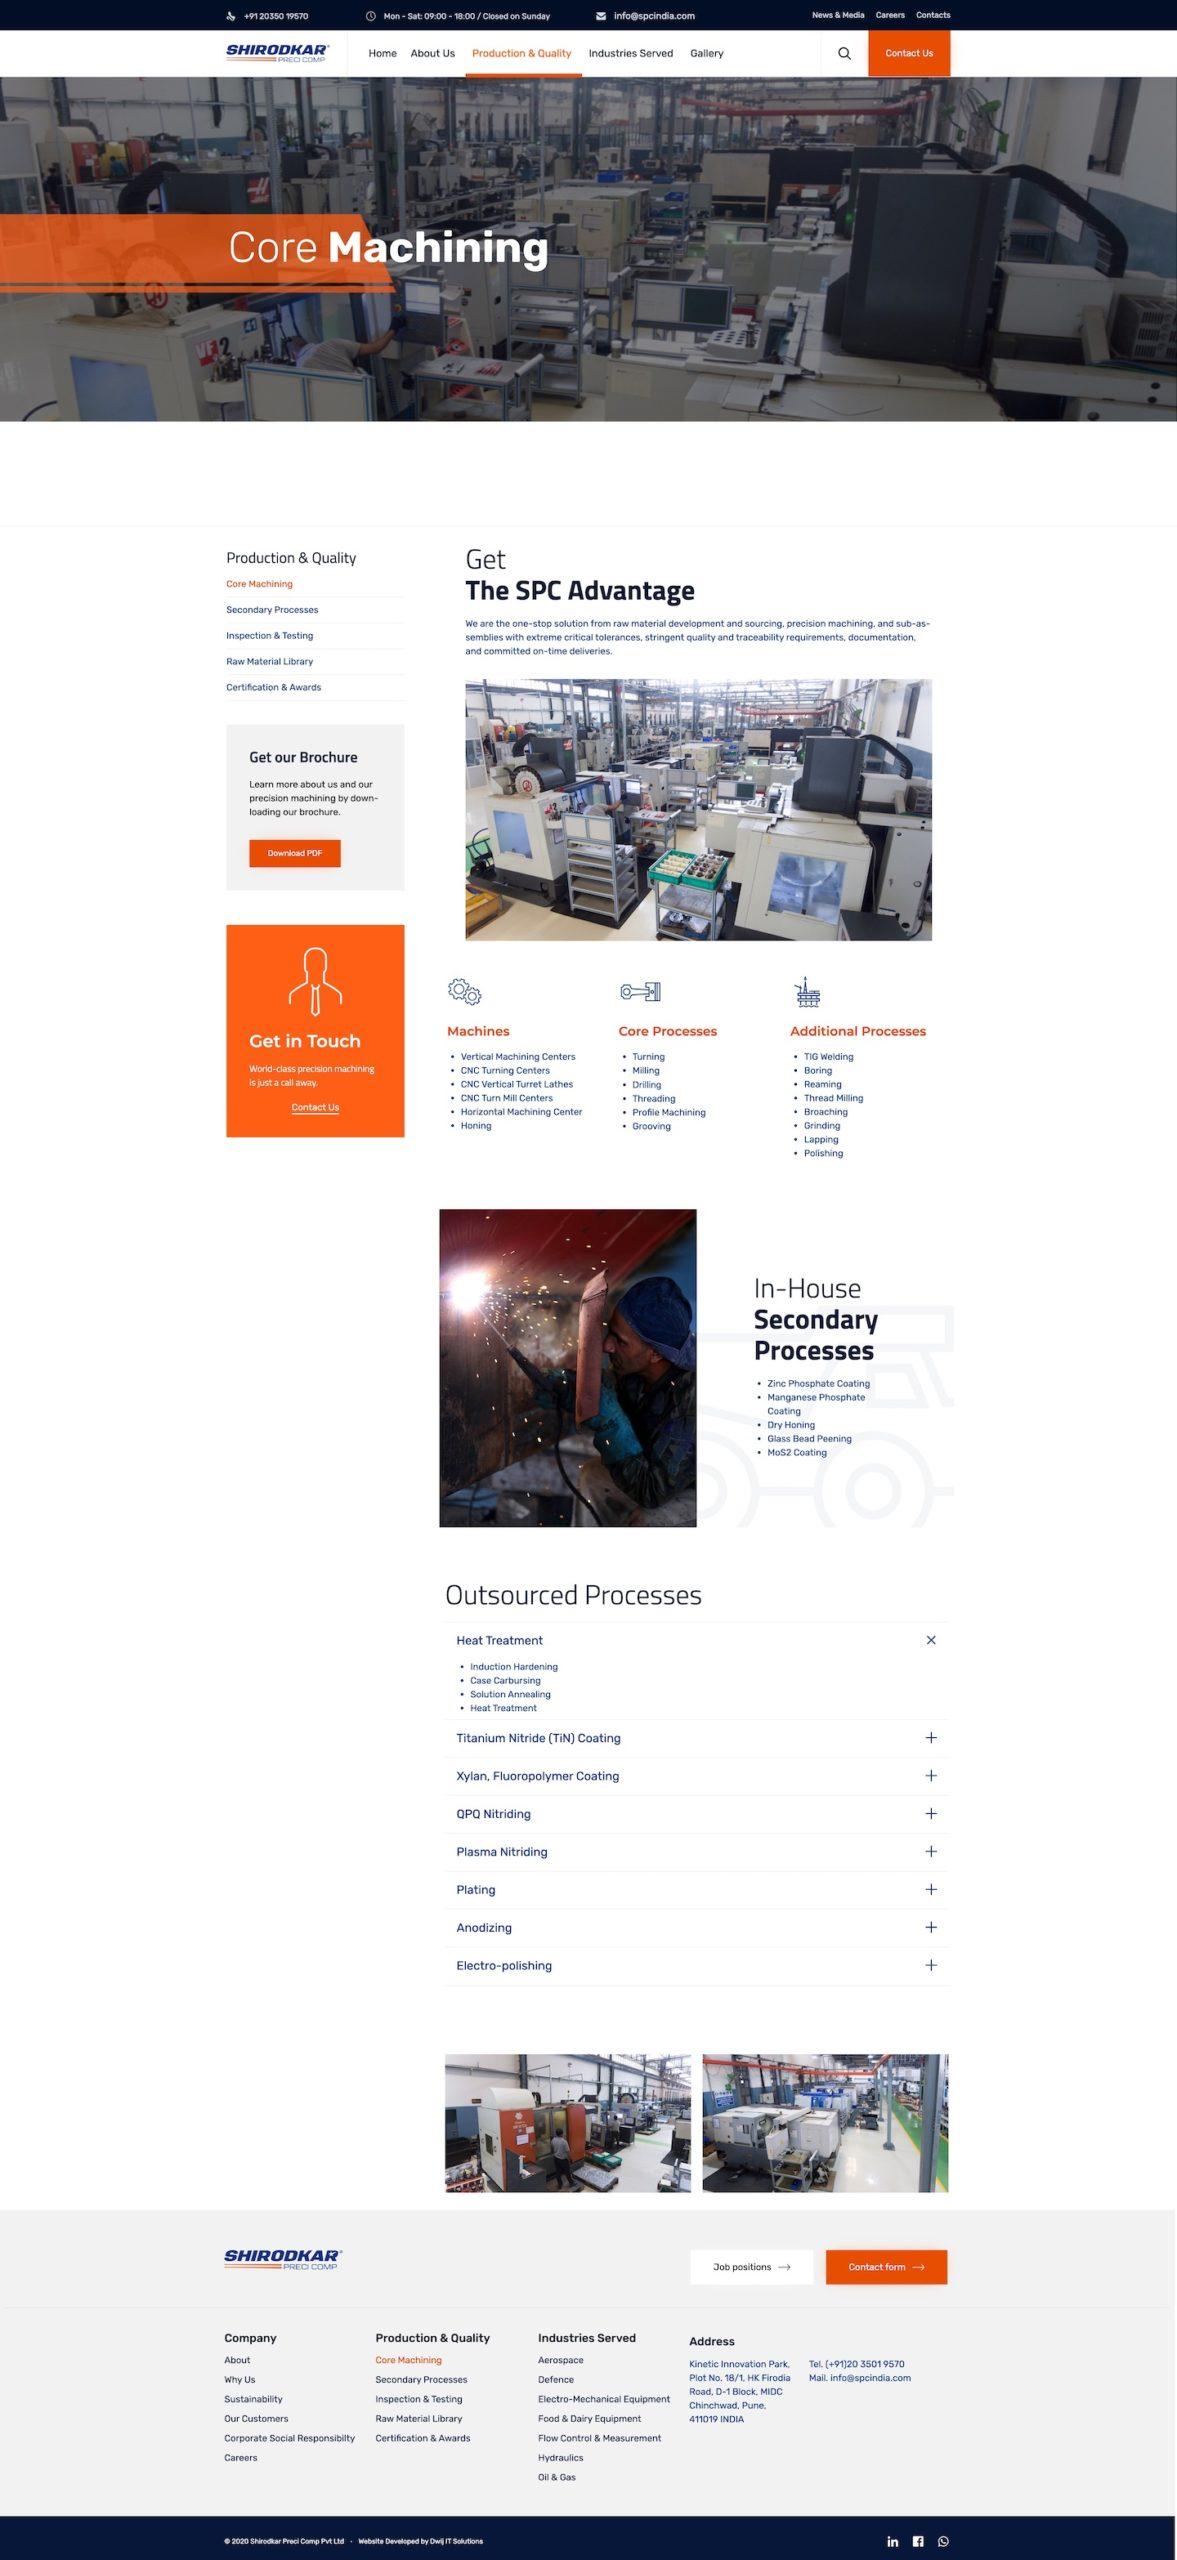 spcindia.com-manufacturing-website-development-pune-india-core-machining